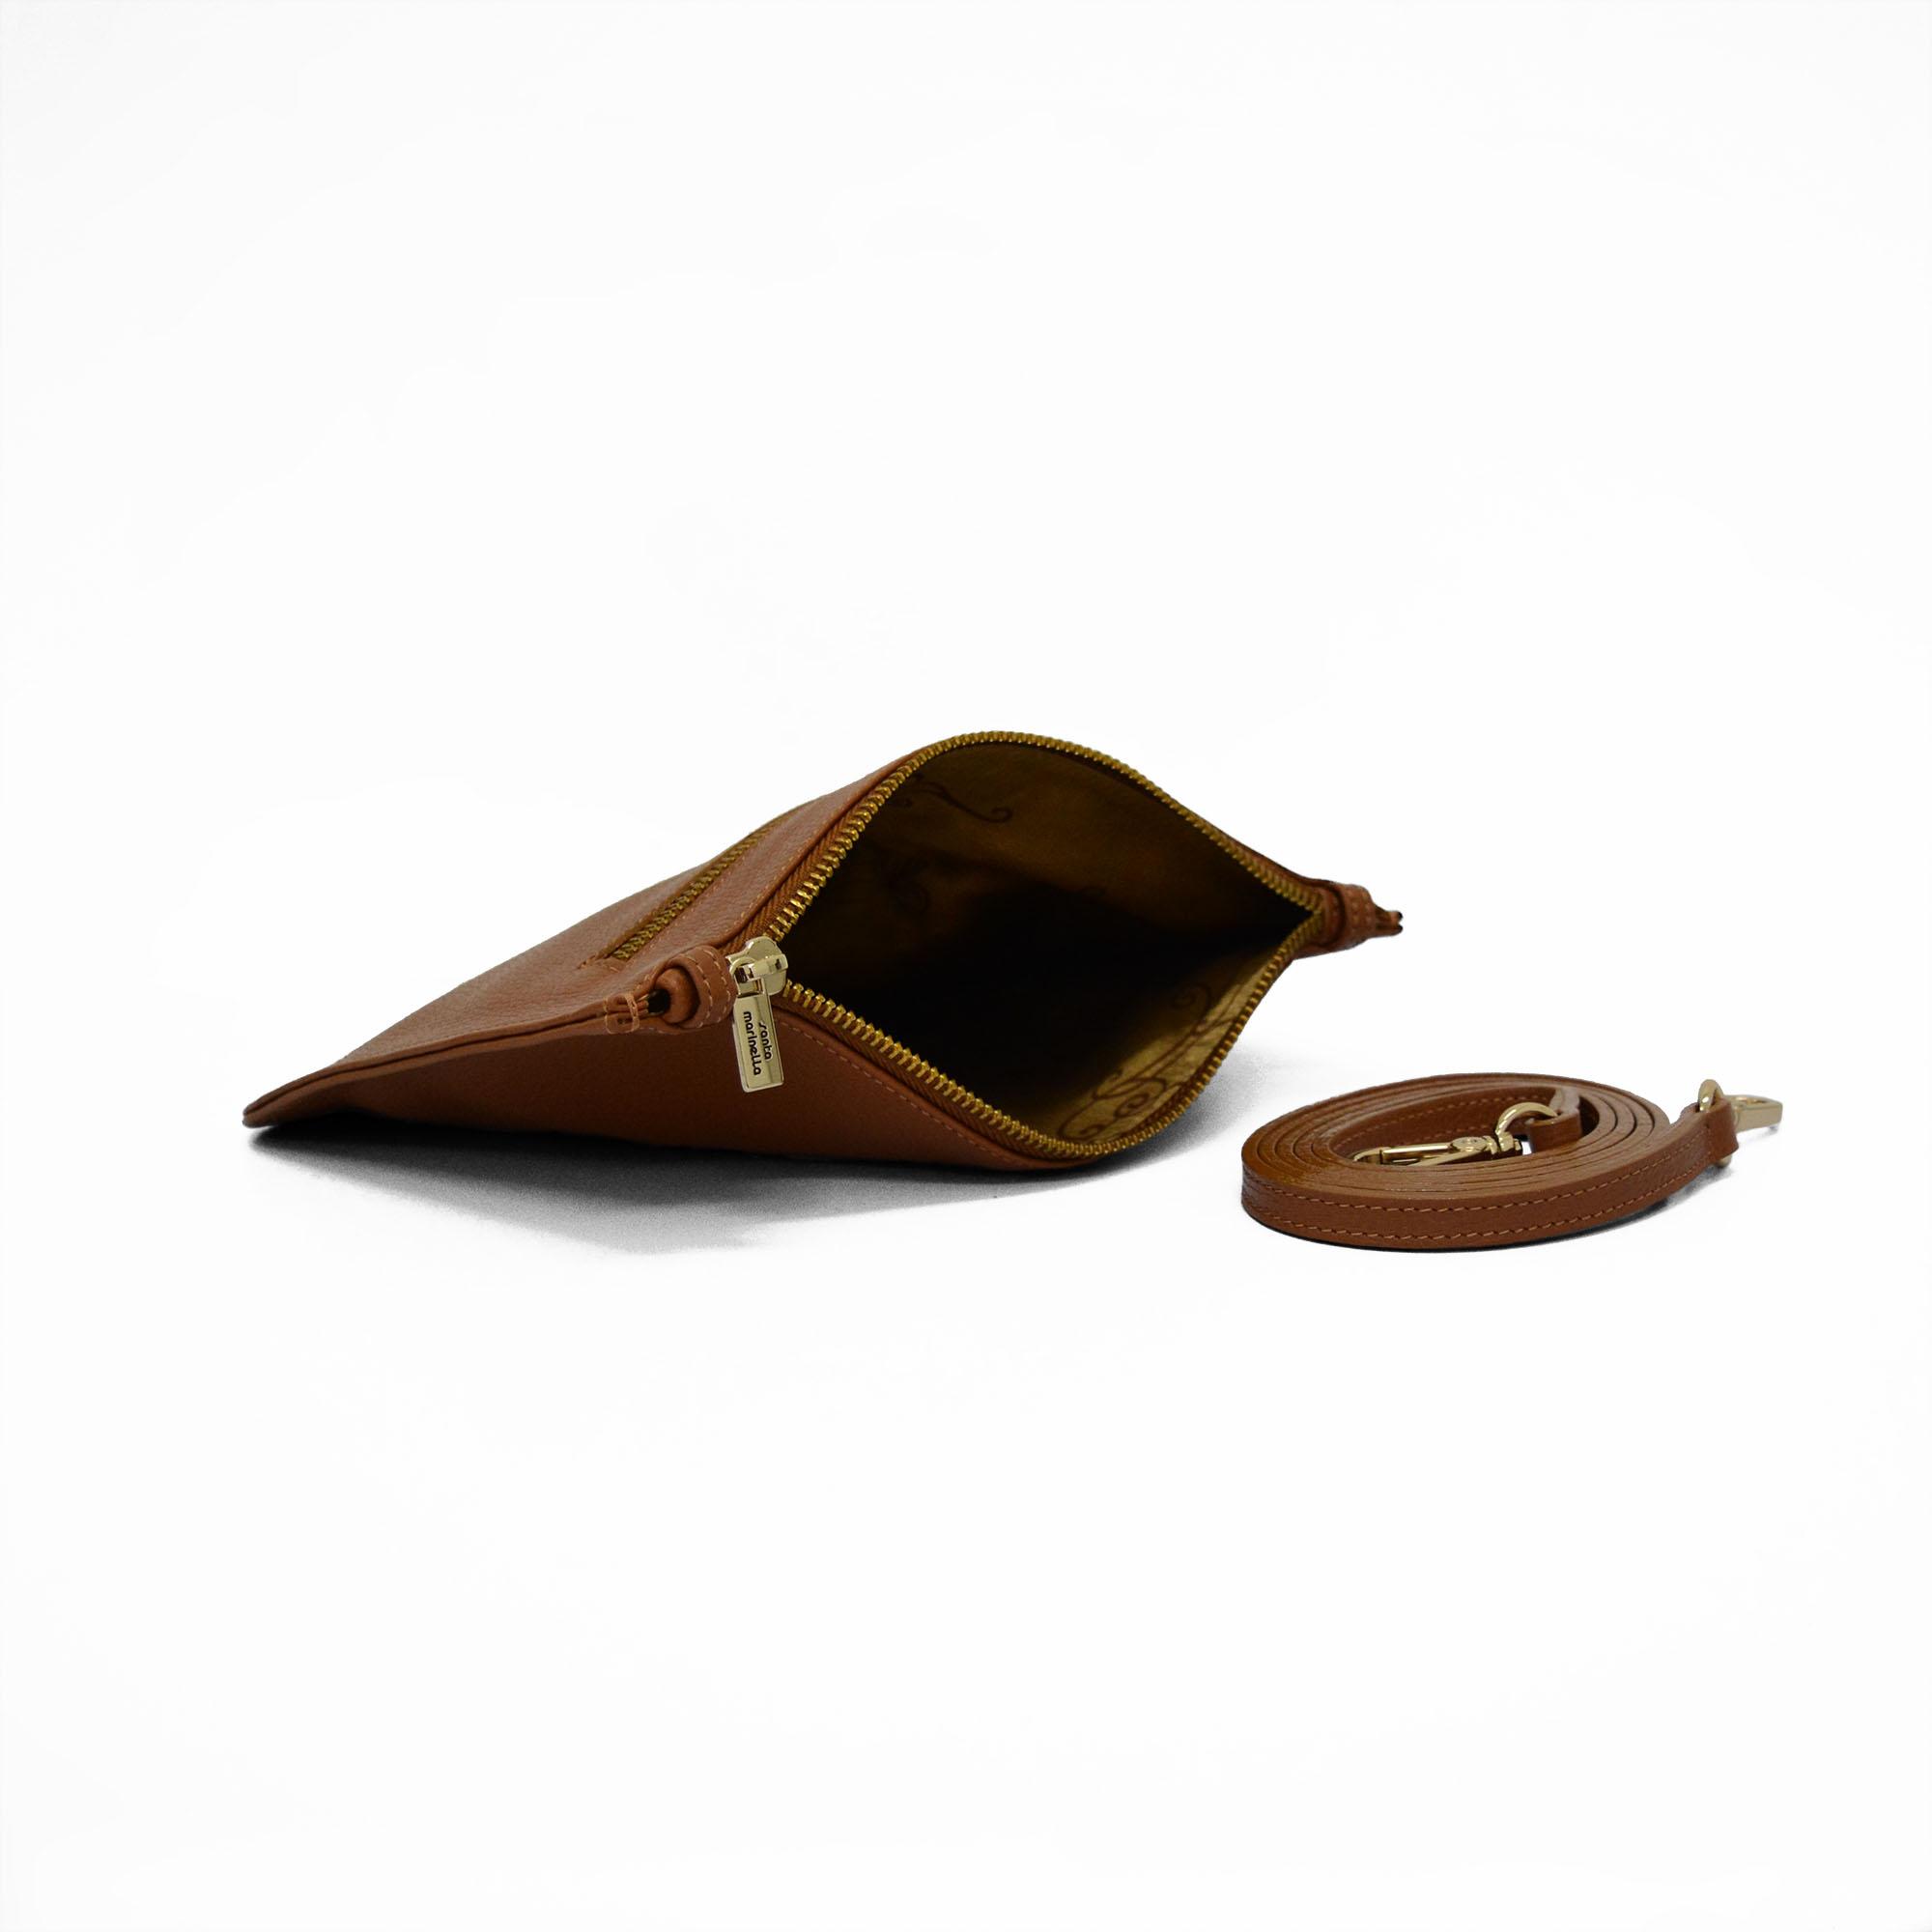 Bolsa Transversal SM 2831 - Couro Floater